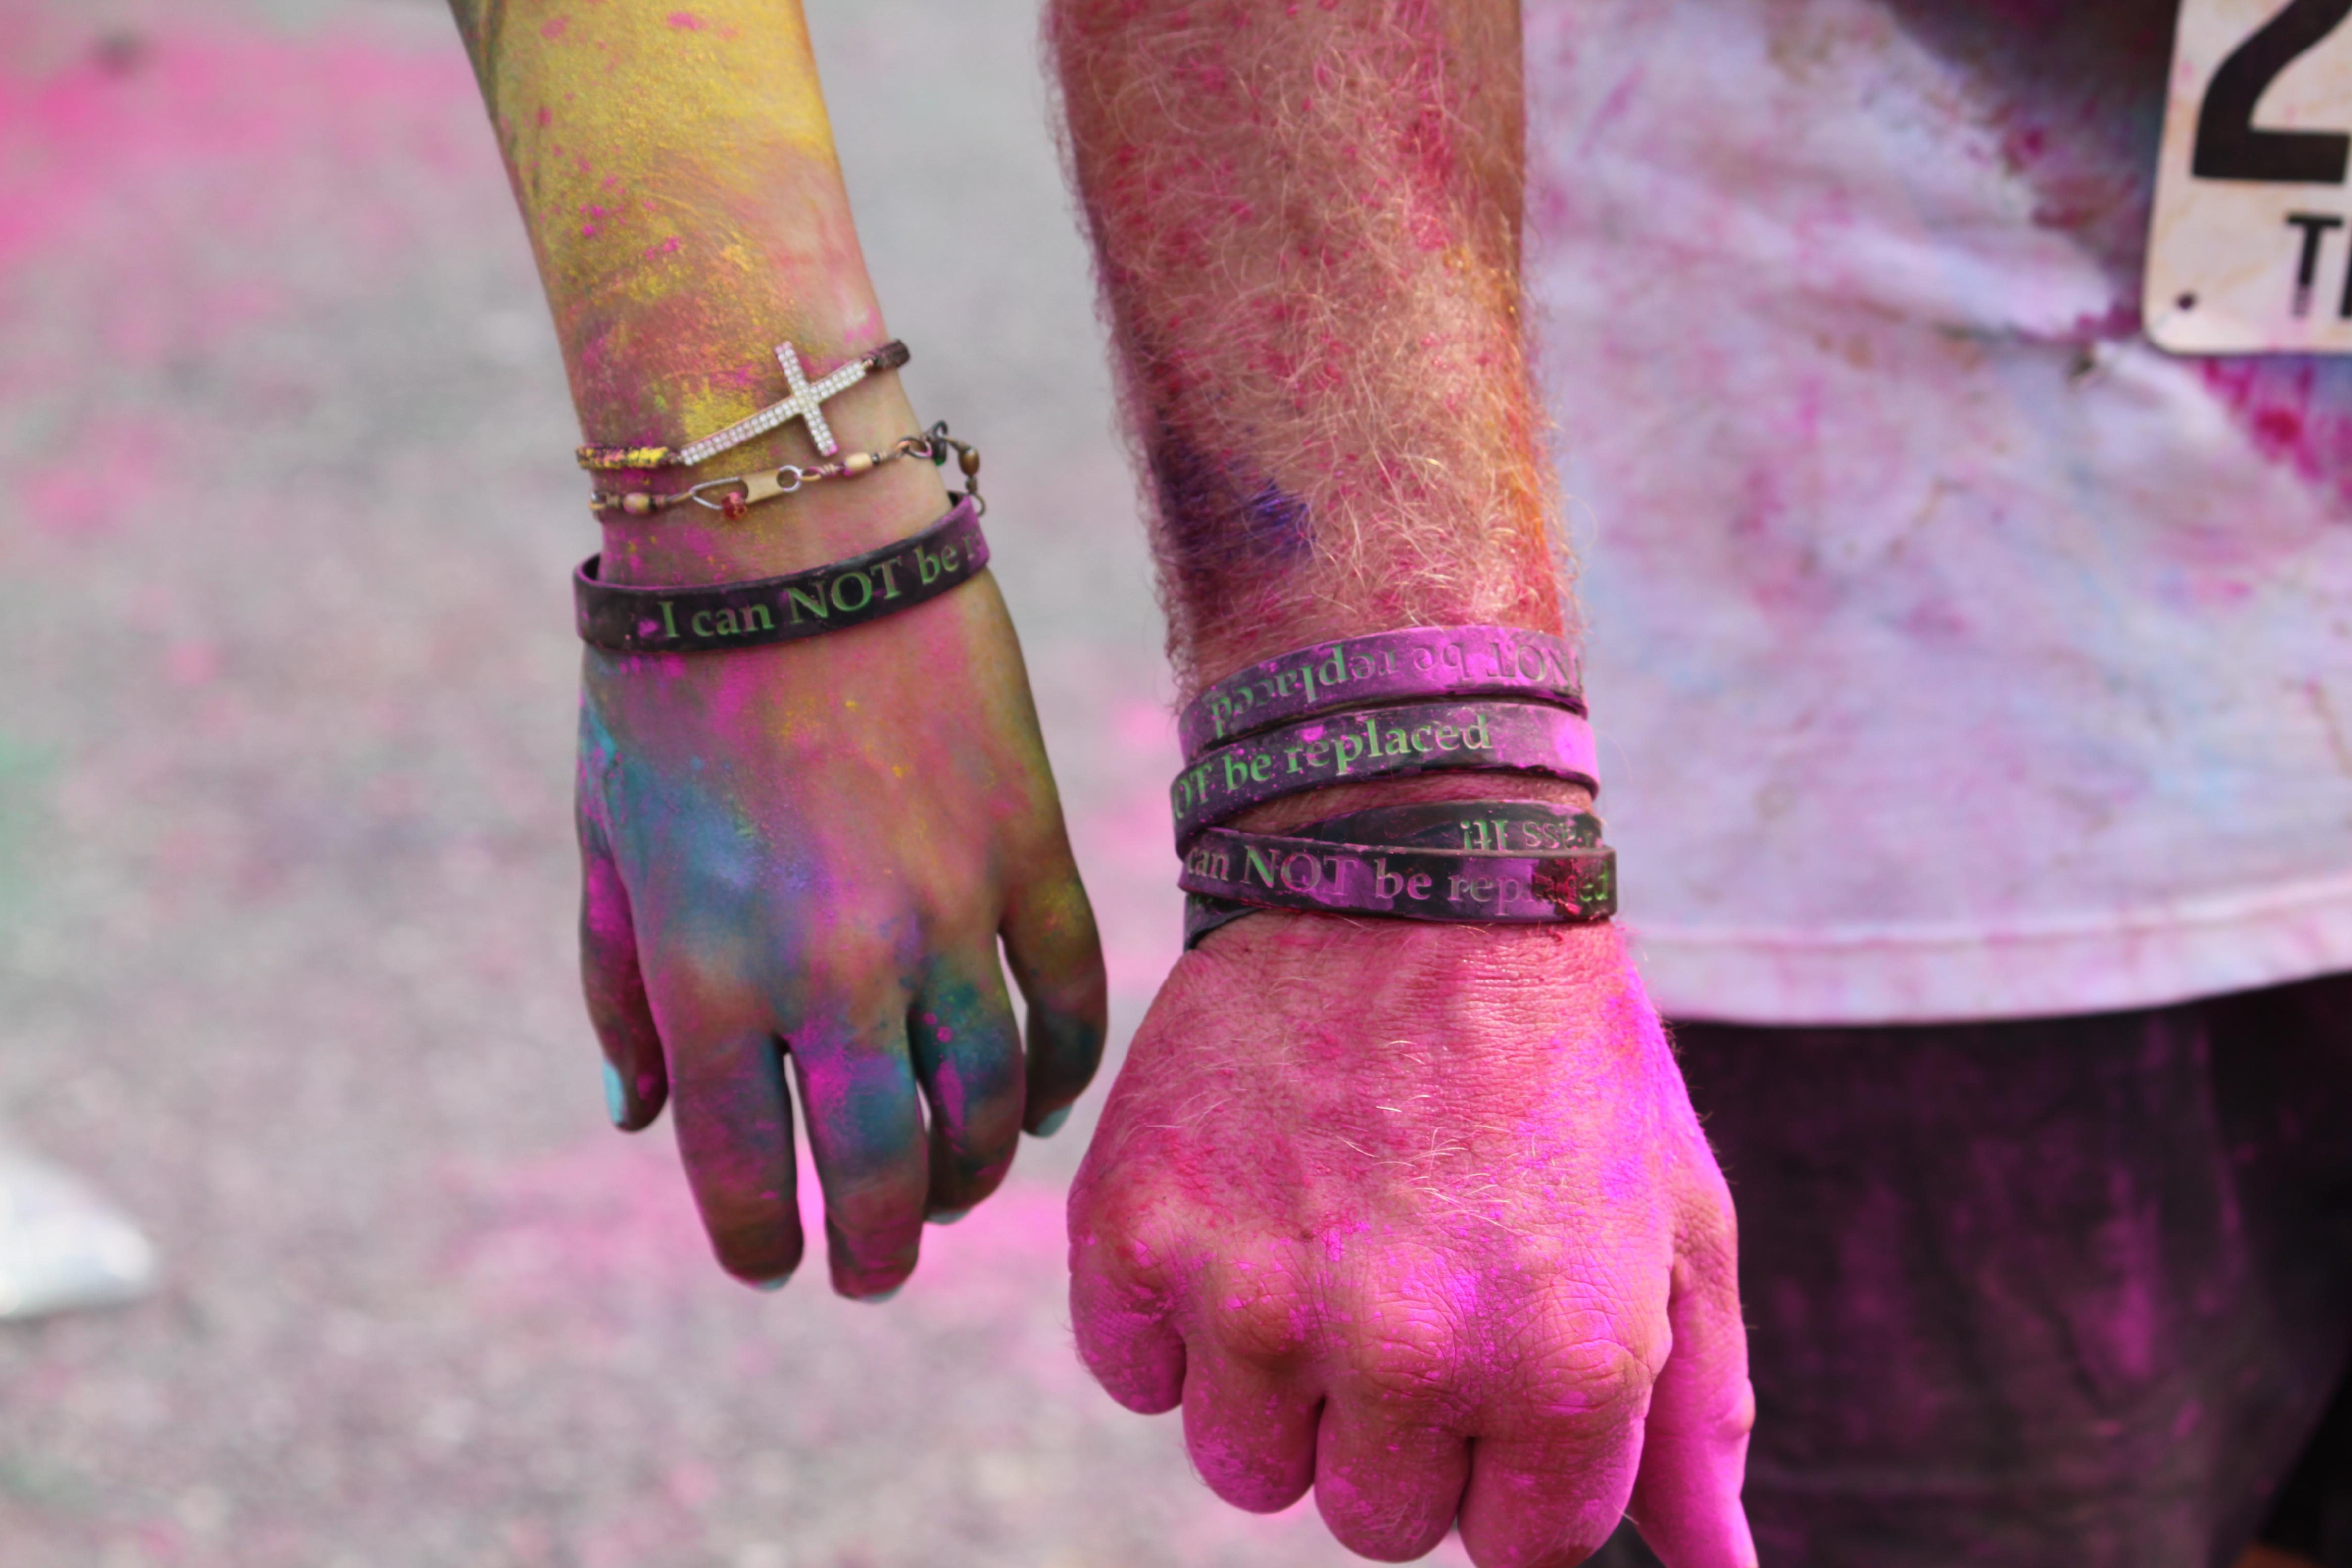 Color Run wristbands